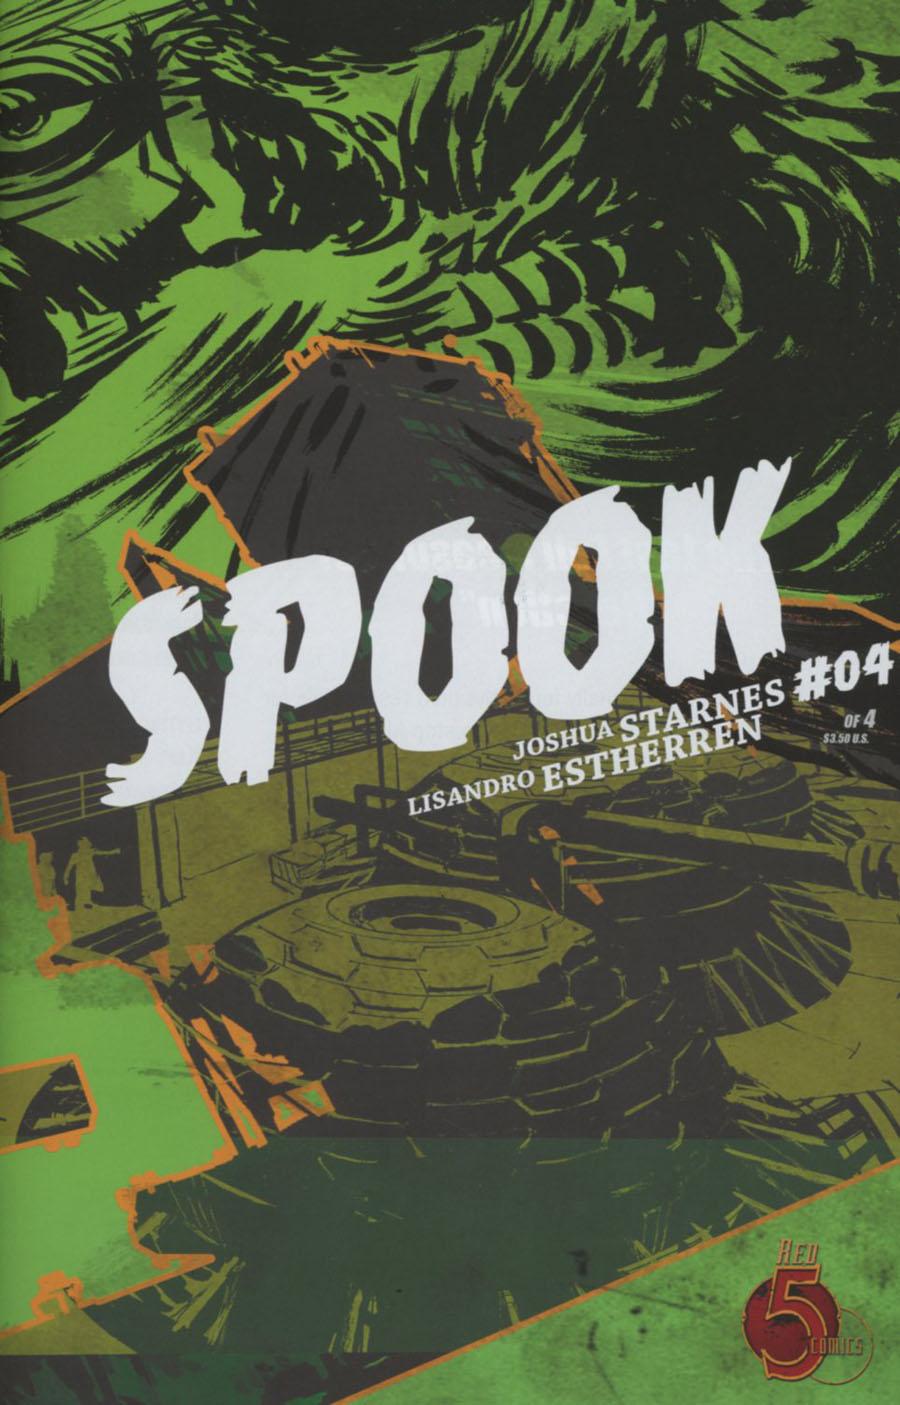 Spook (Red 5 Comics) #4